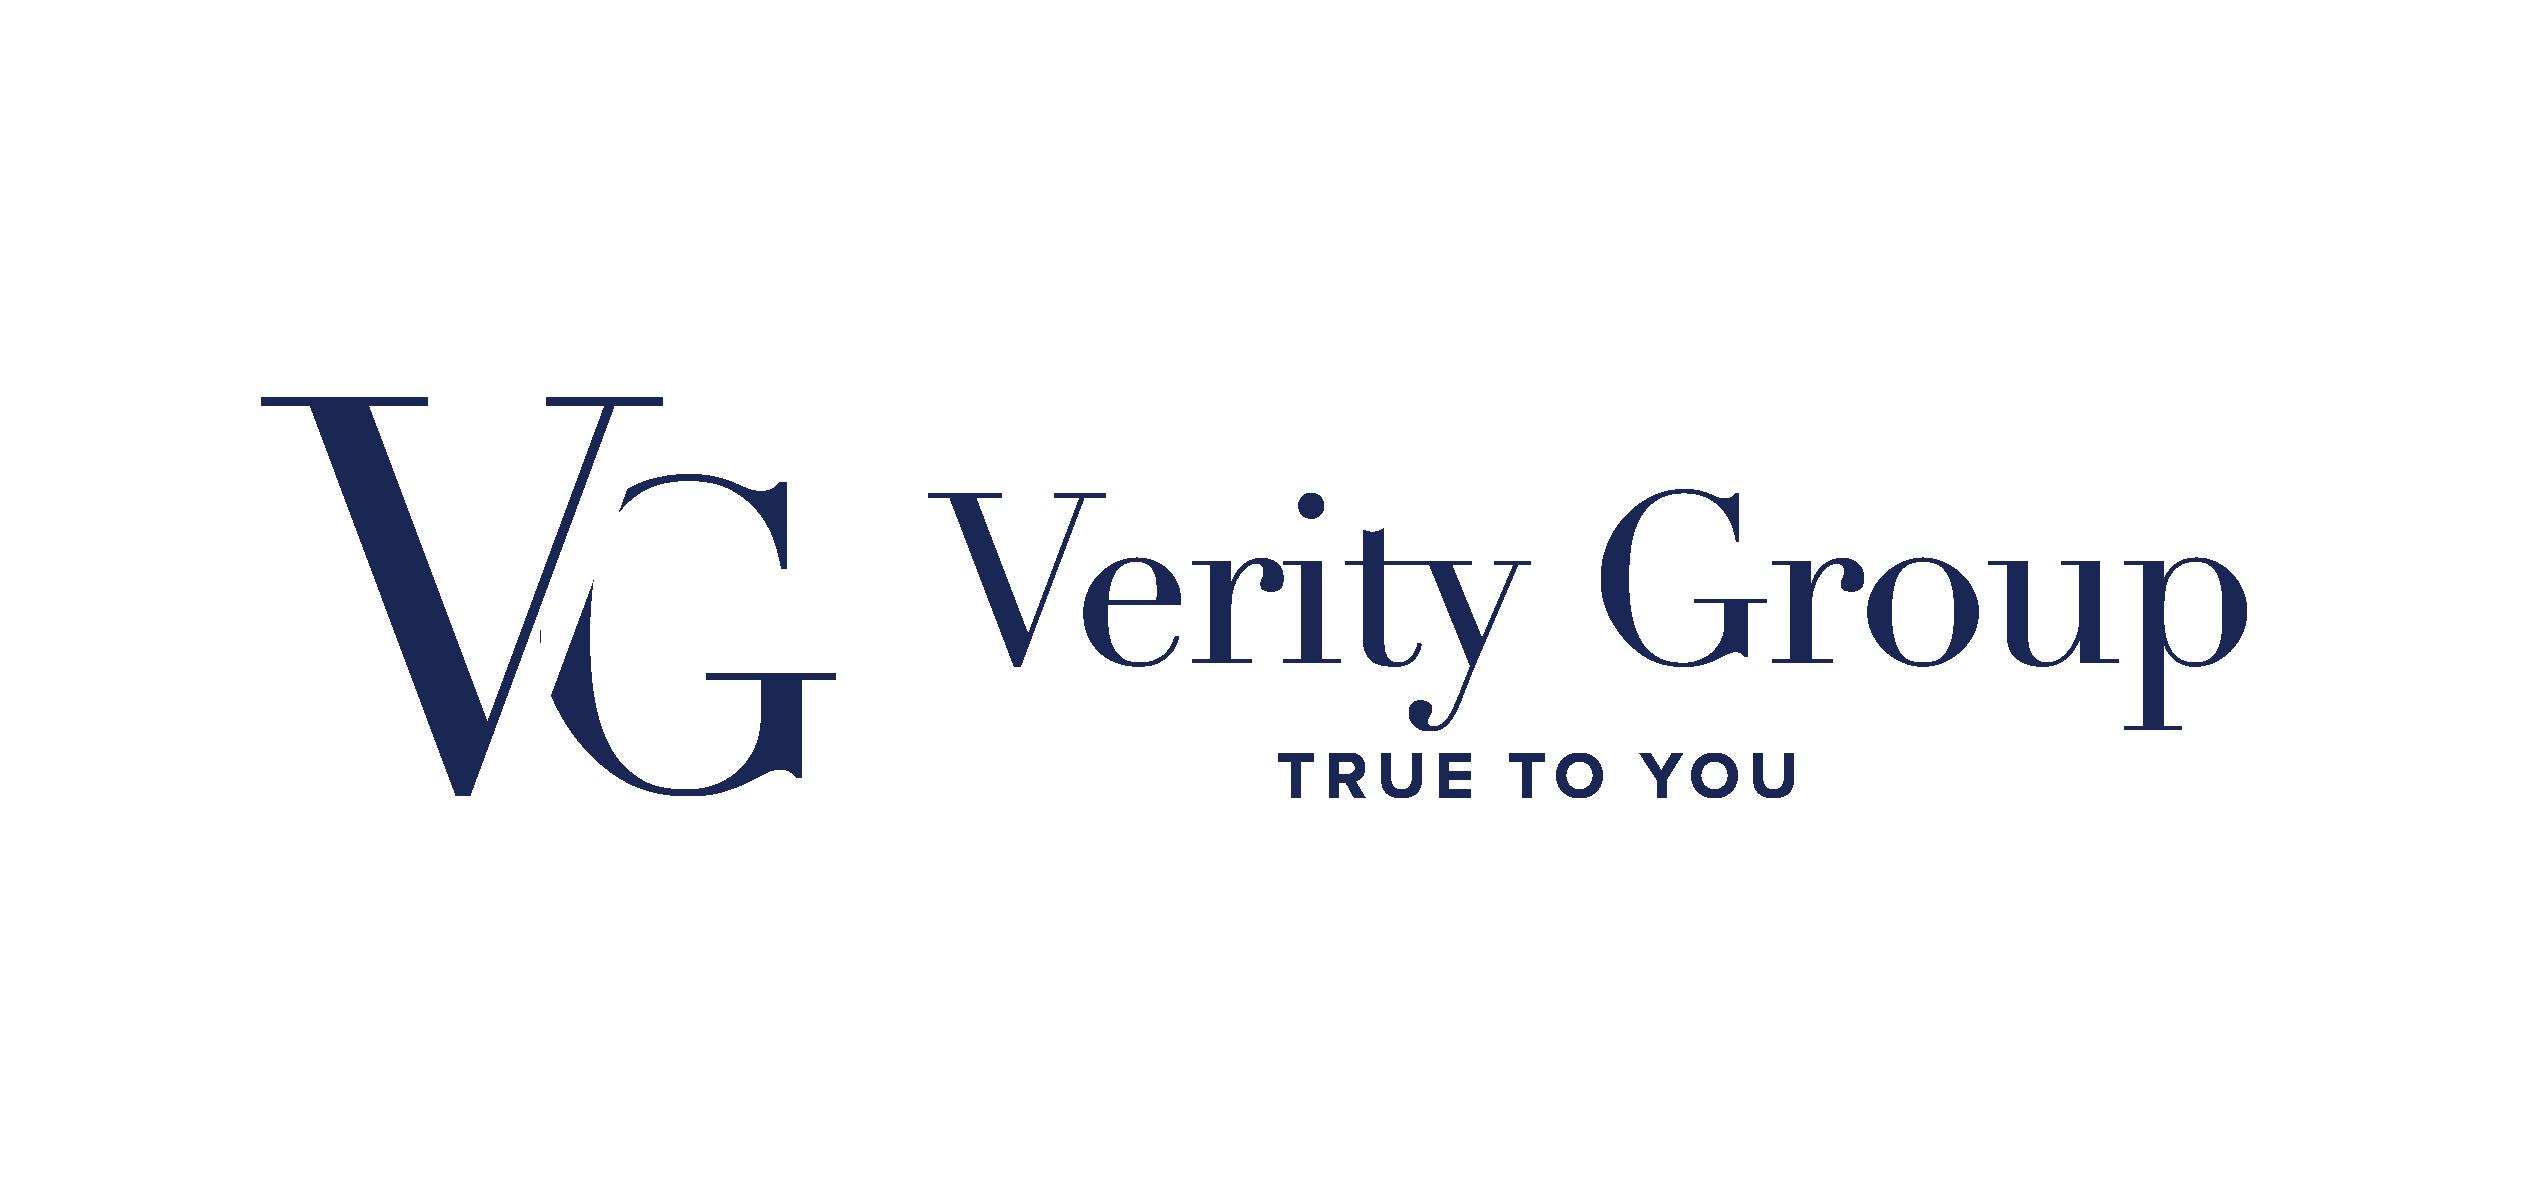 Verity Group logo